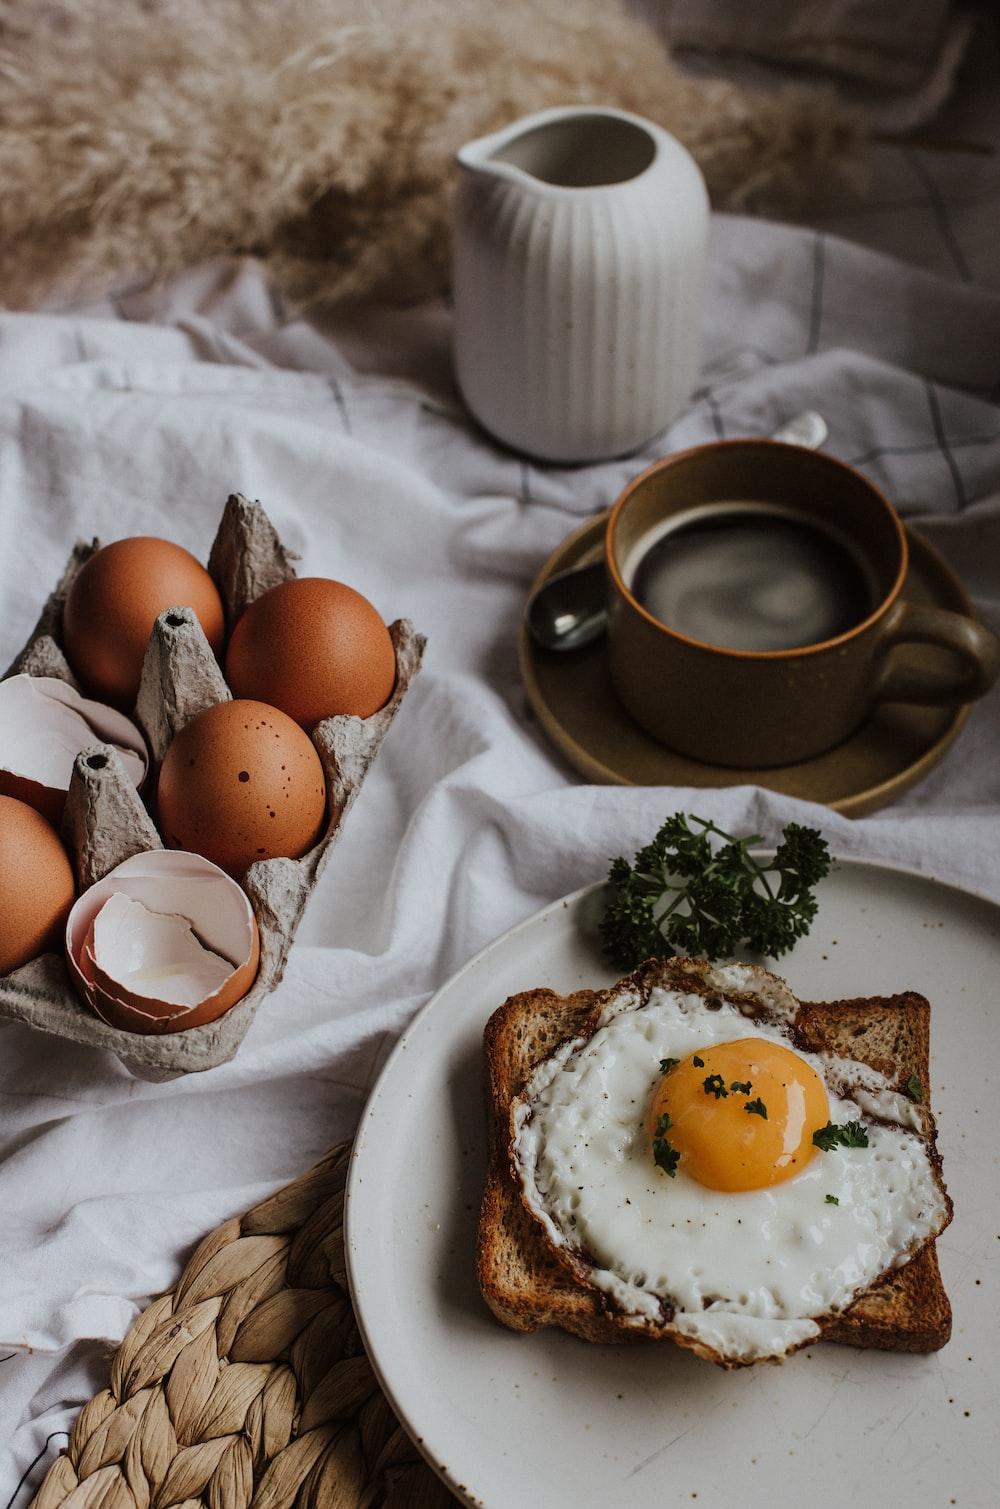 three eggs on white ceramic plate beside brown ceramic mug